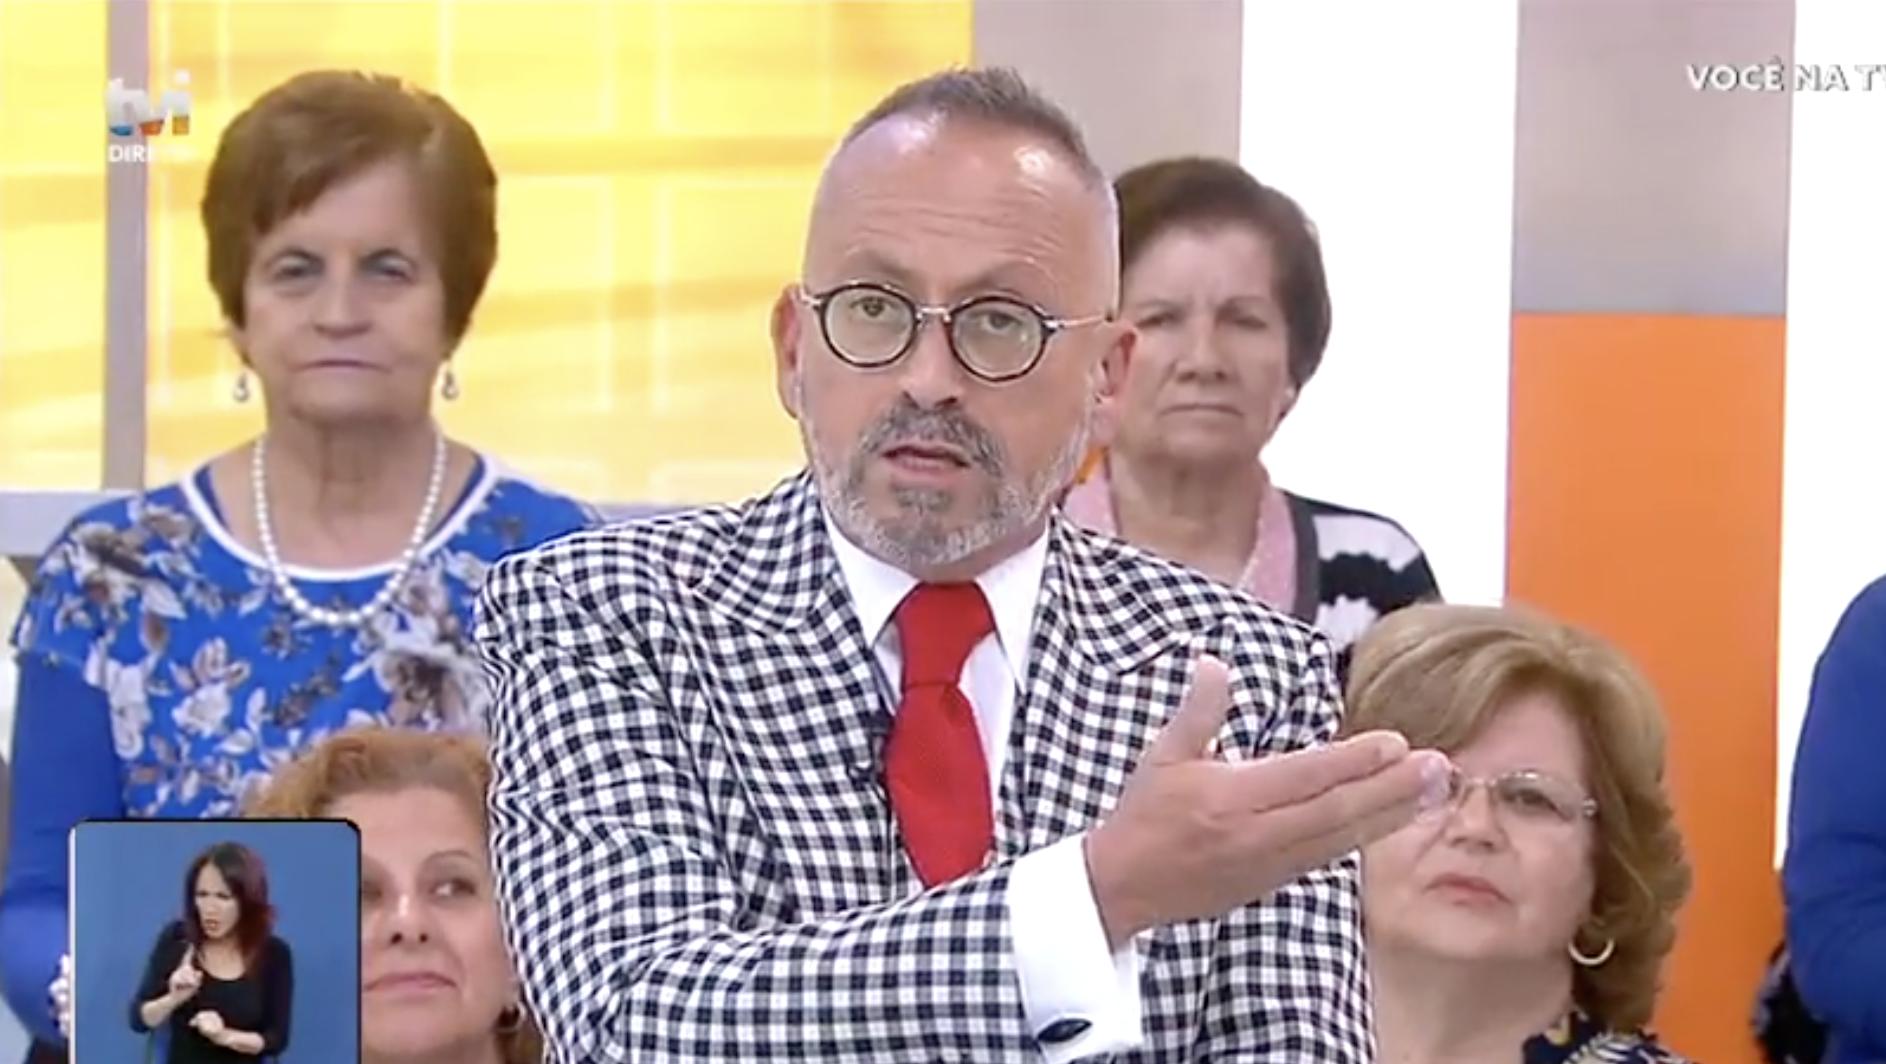 Manuel Luis Goucha Voce Na Tv Manuel Luís Goucha Bane Seguidora Em Direto